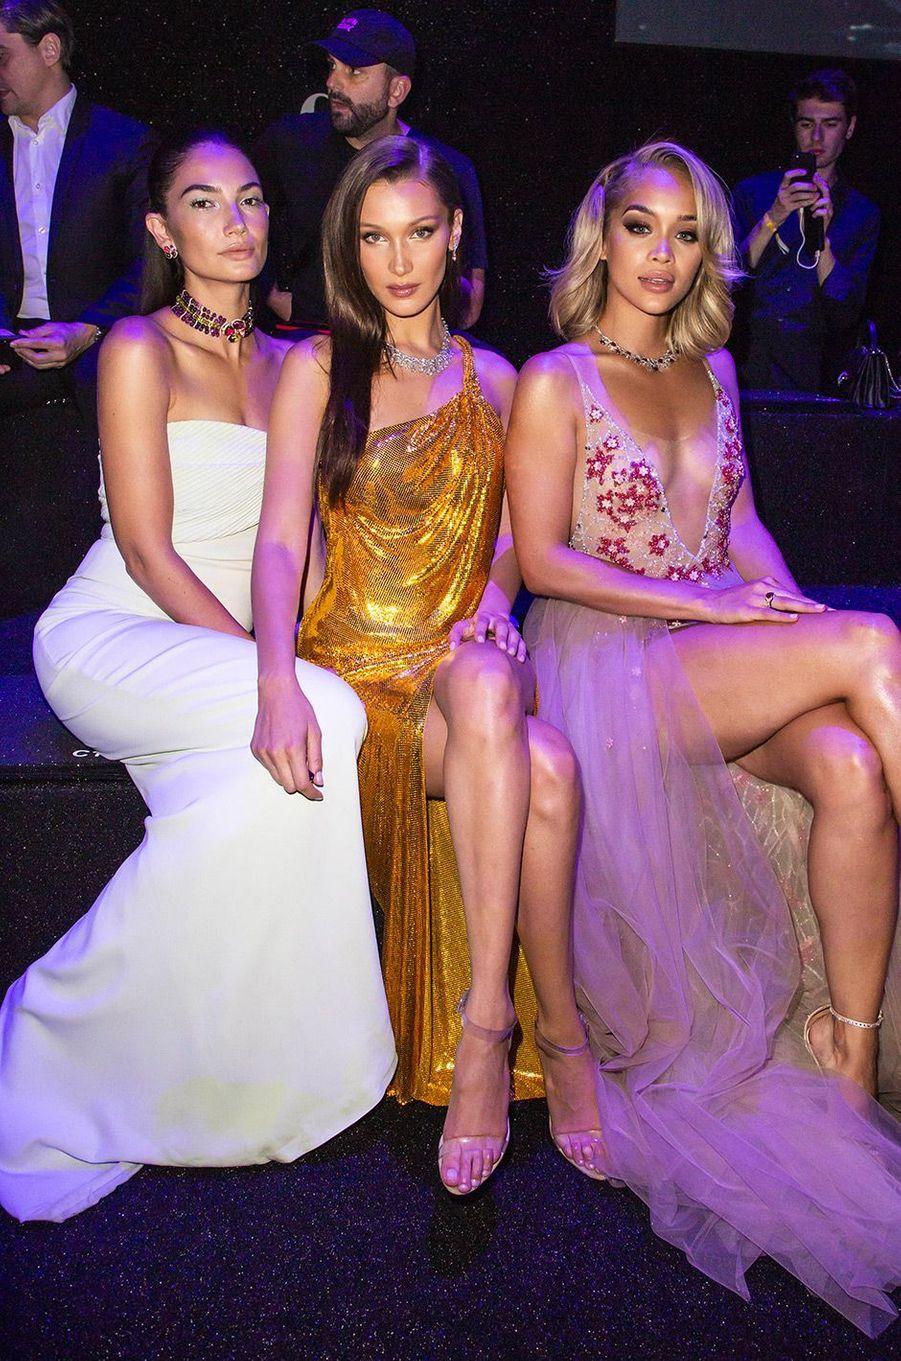 Lily Aldridge, Bella Hadid et Jasmine Sanders au Gala Bulgari à Rome, jeudi 28 juin 2018